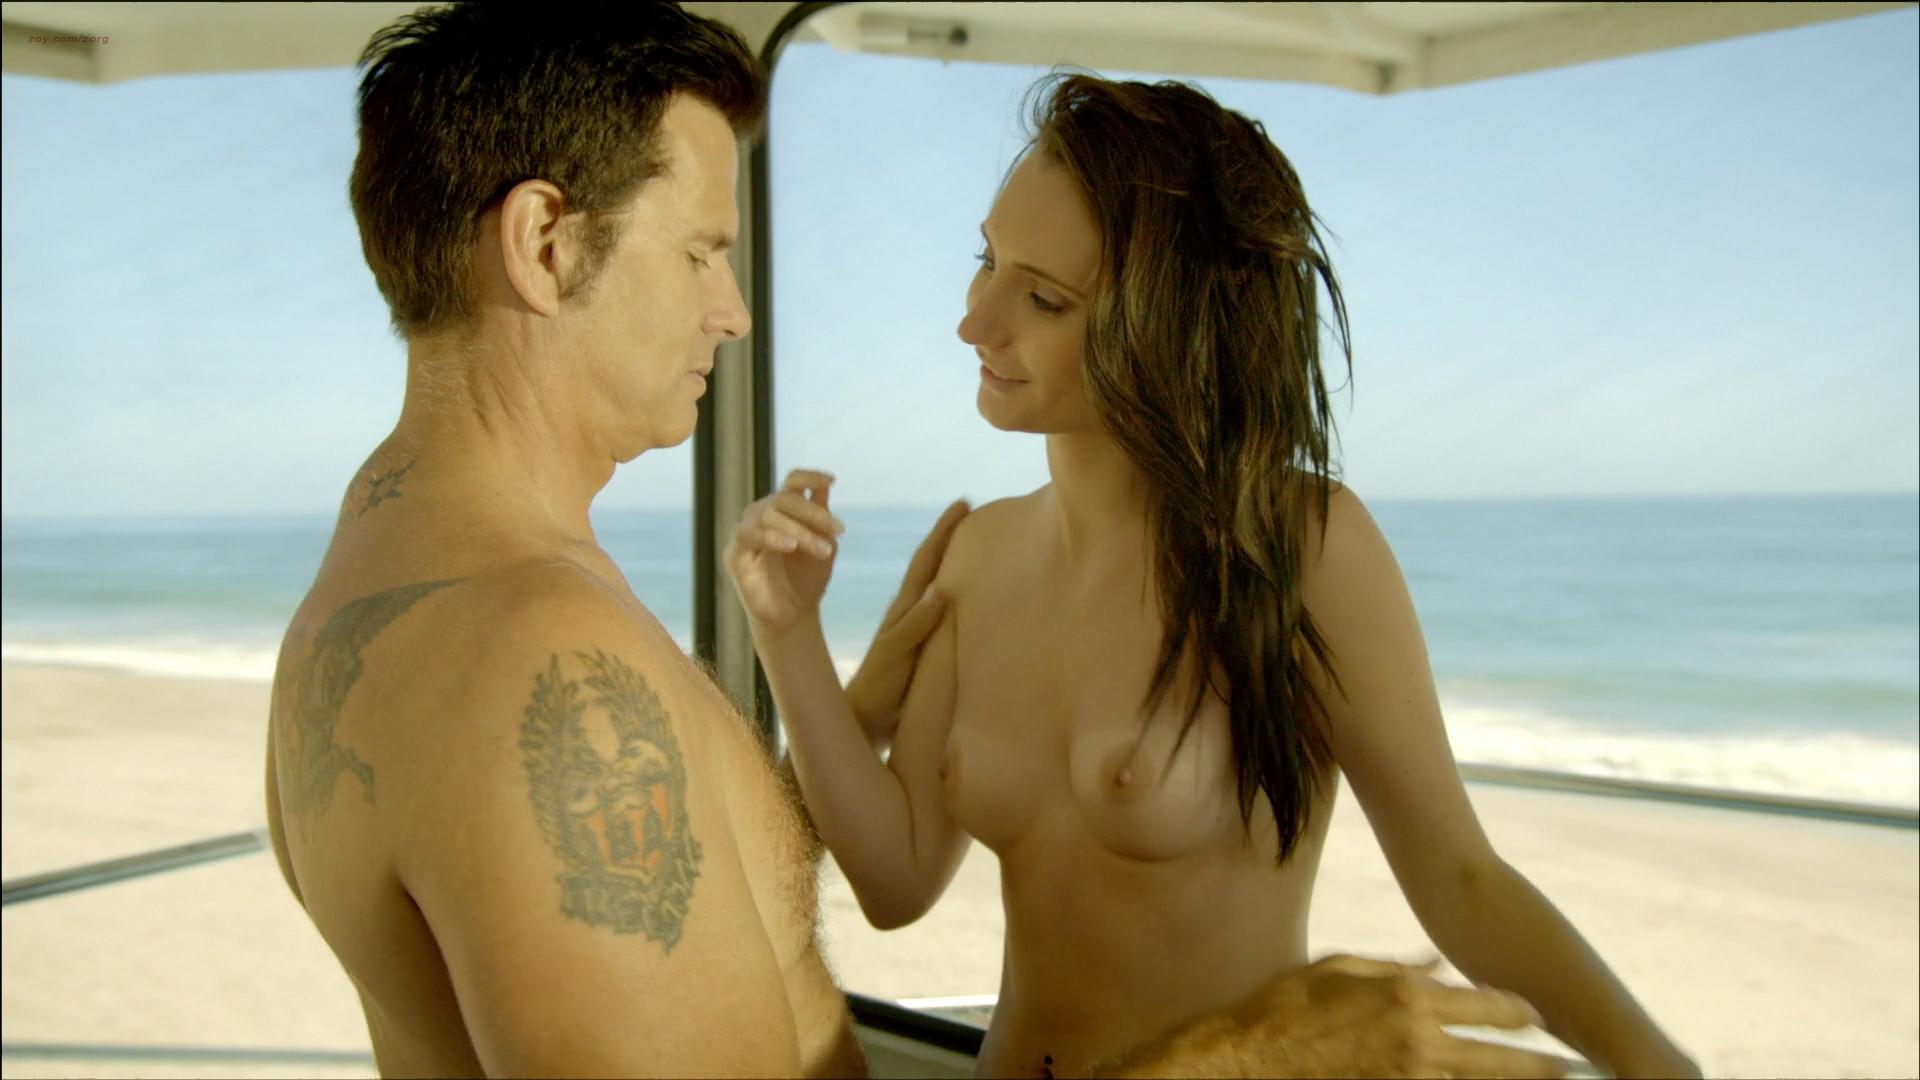 Jena Sims nude sex Mischa Barton hot others nude - American Beach House (2015) hd1080p BluRay (10)